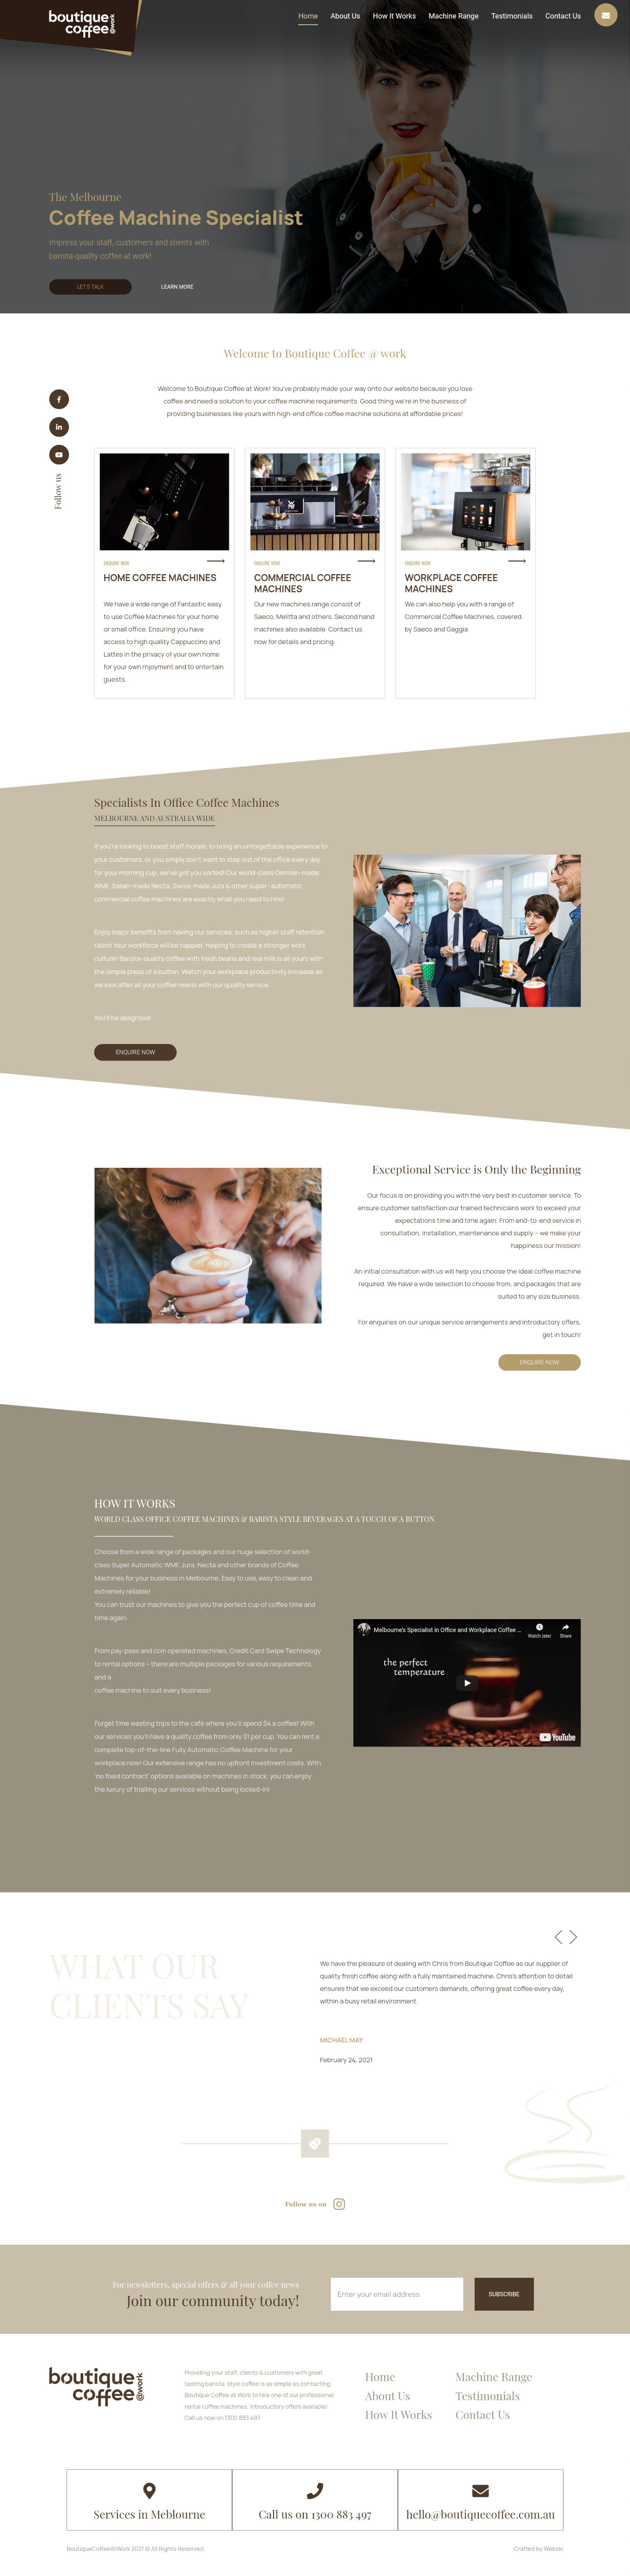 web-design-coffee-distributor